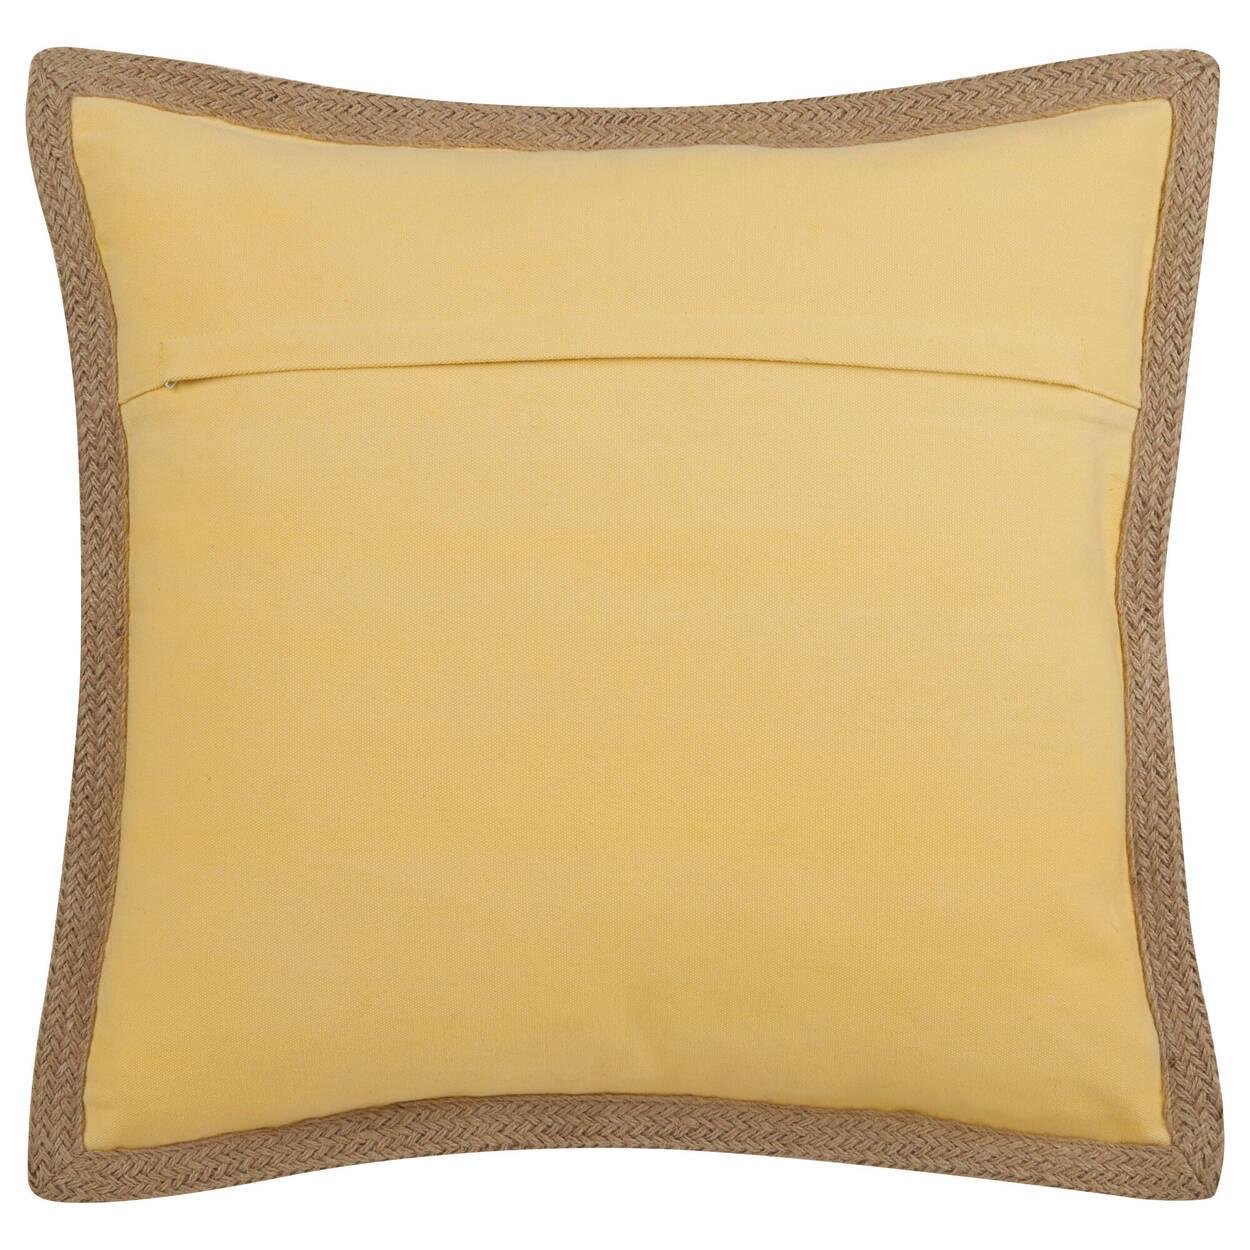 "Helgi Decorative Pillow 19"" x 19"""